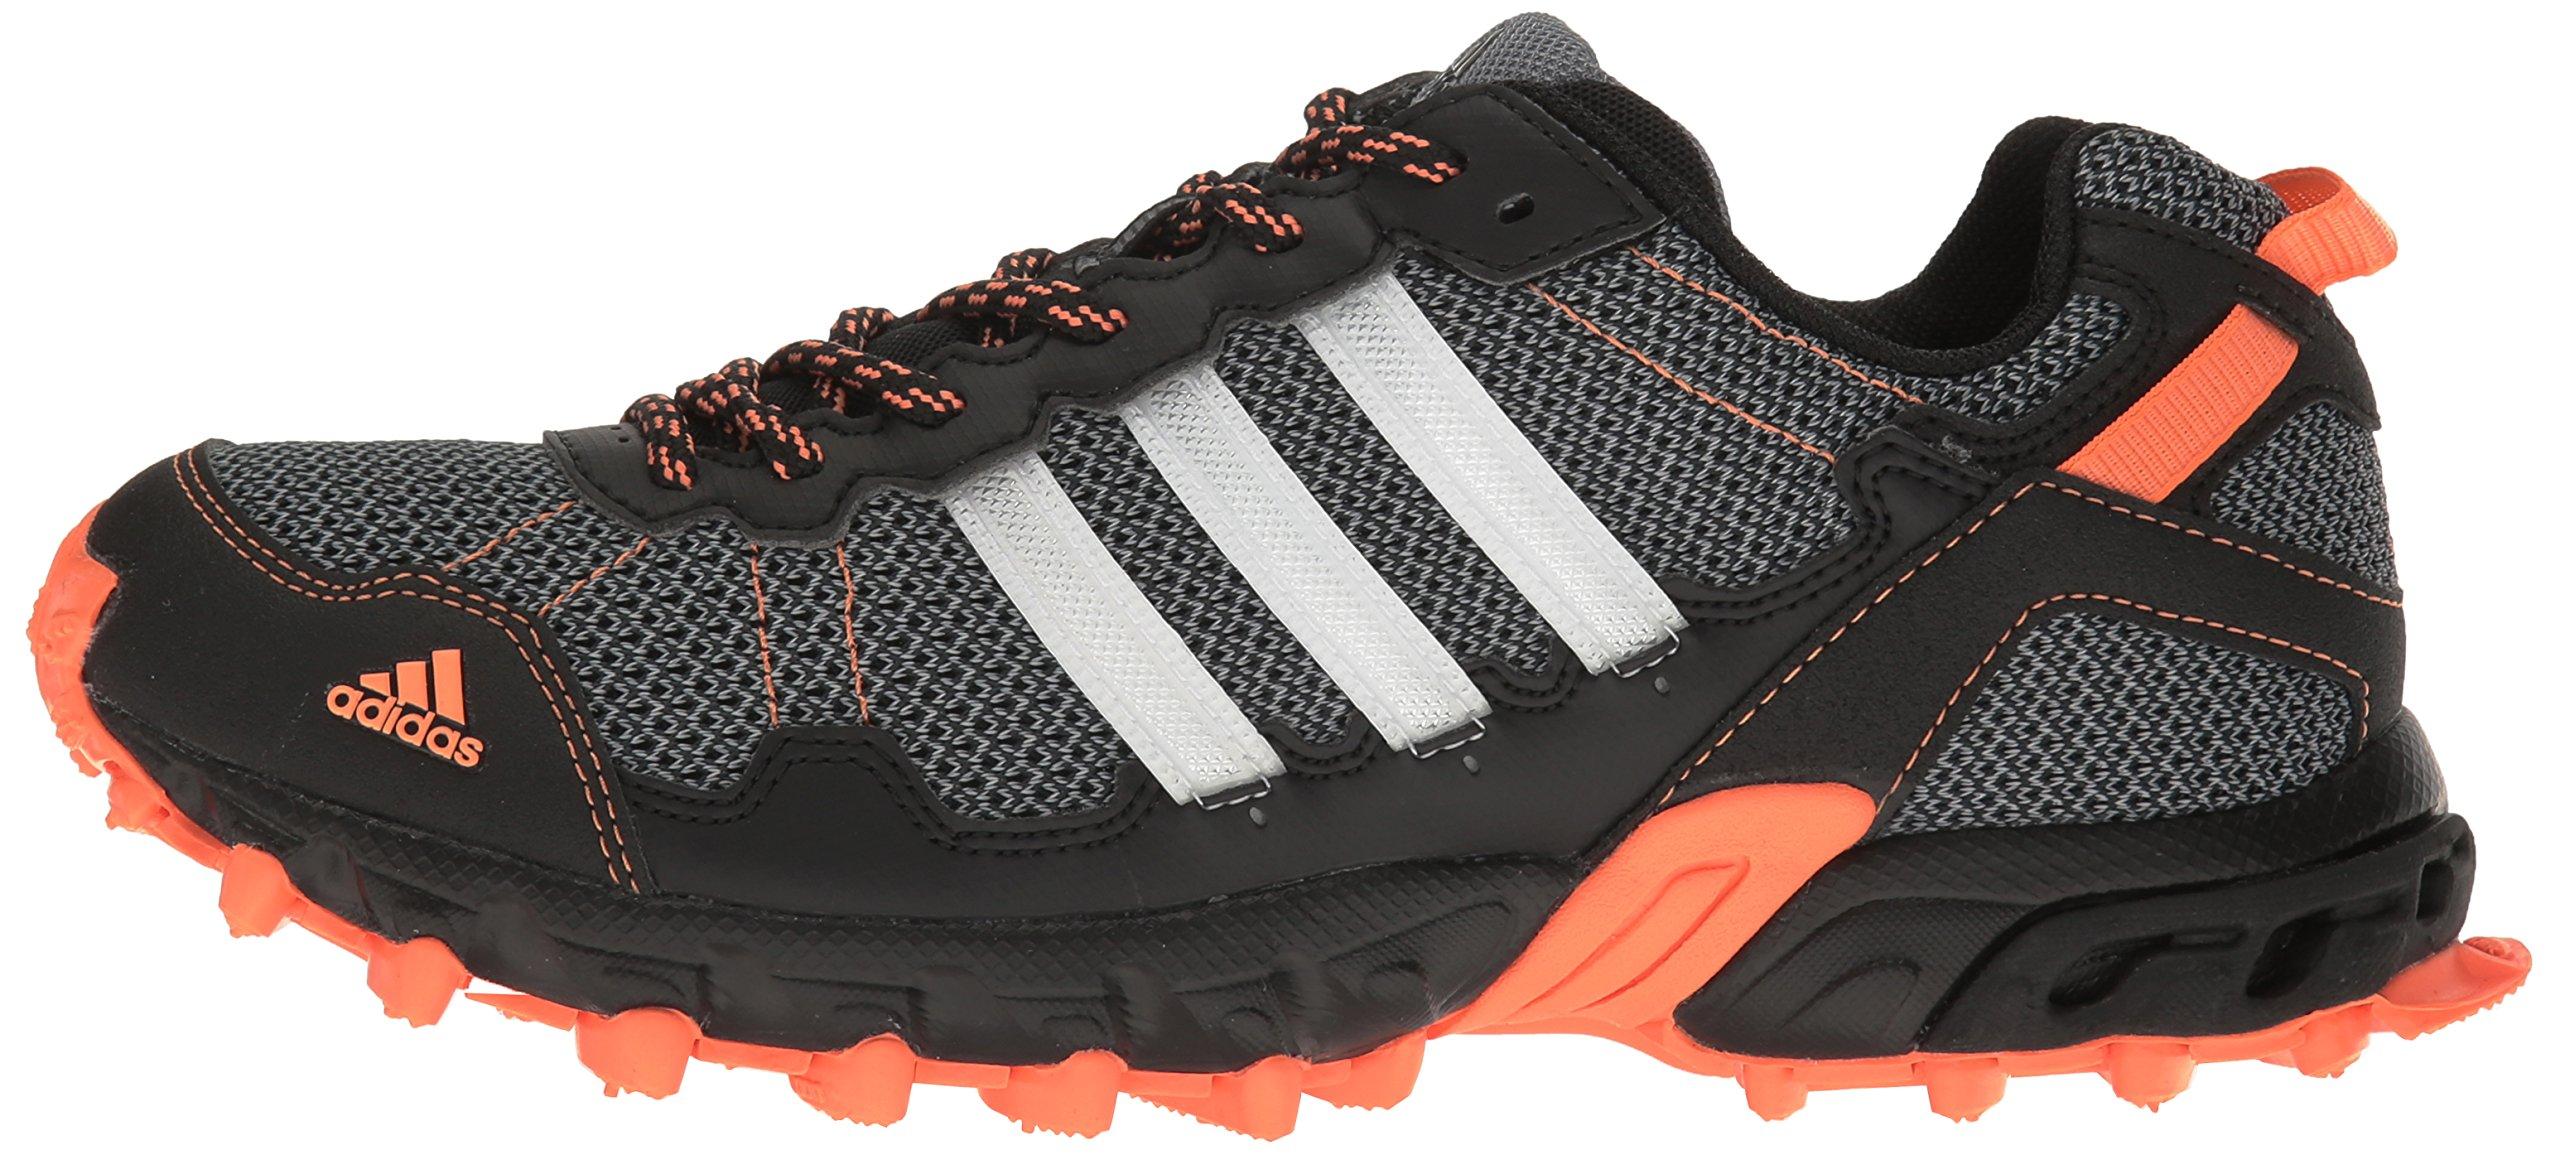 adidas Women's Rockadia Trail W Running Shoe Black/White/Easy Orange 6 M US by adidas (Image #5)